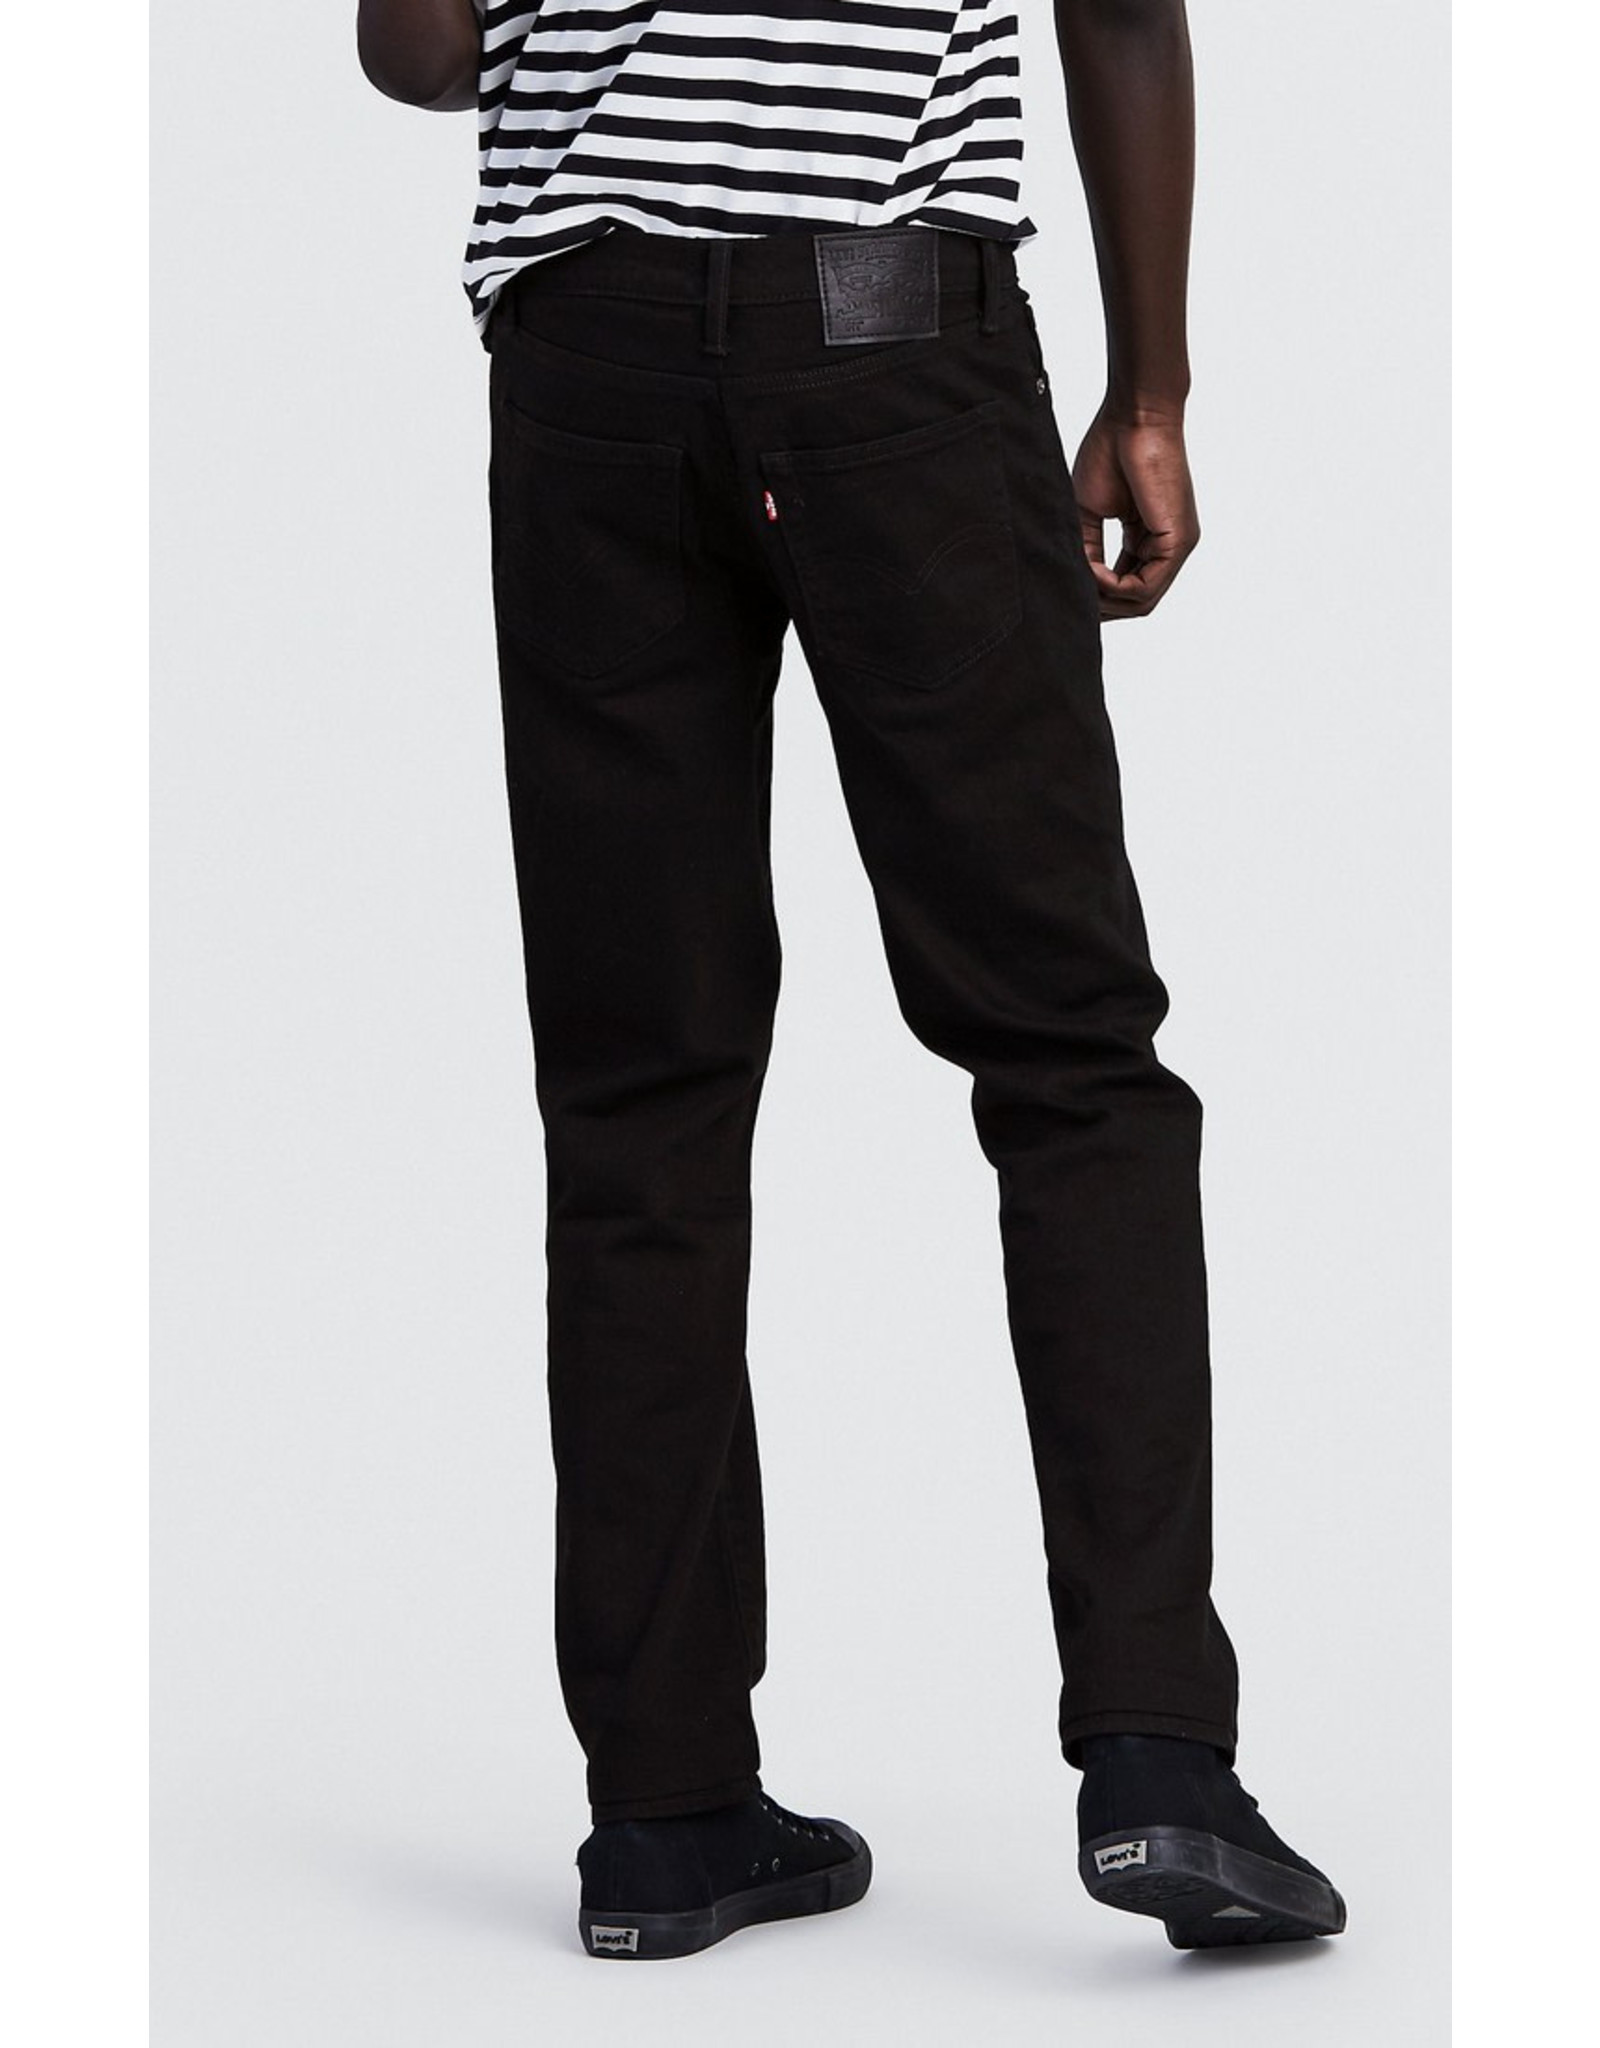 Levi's - 511 Slim